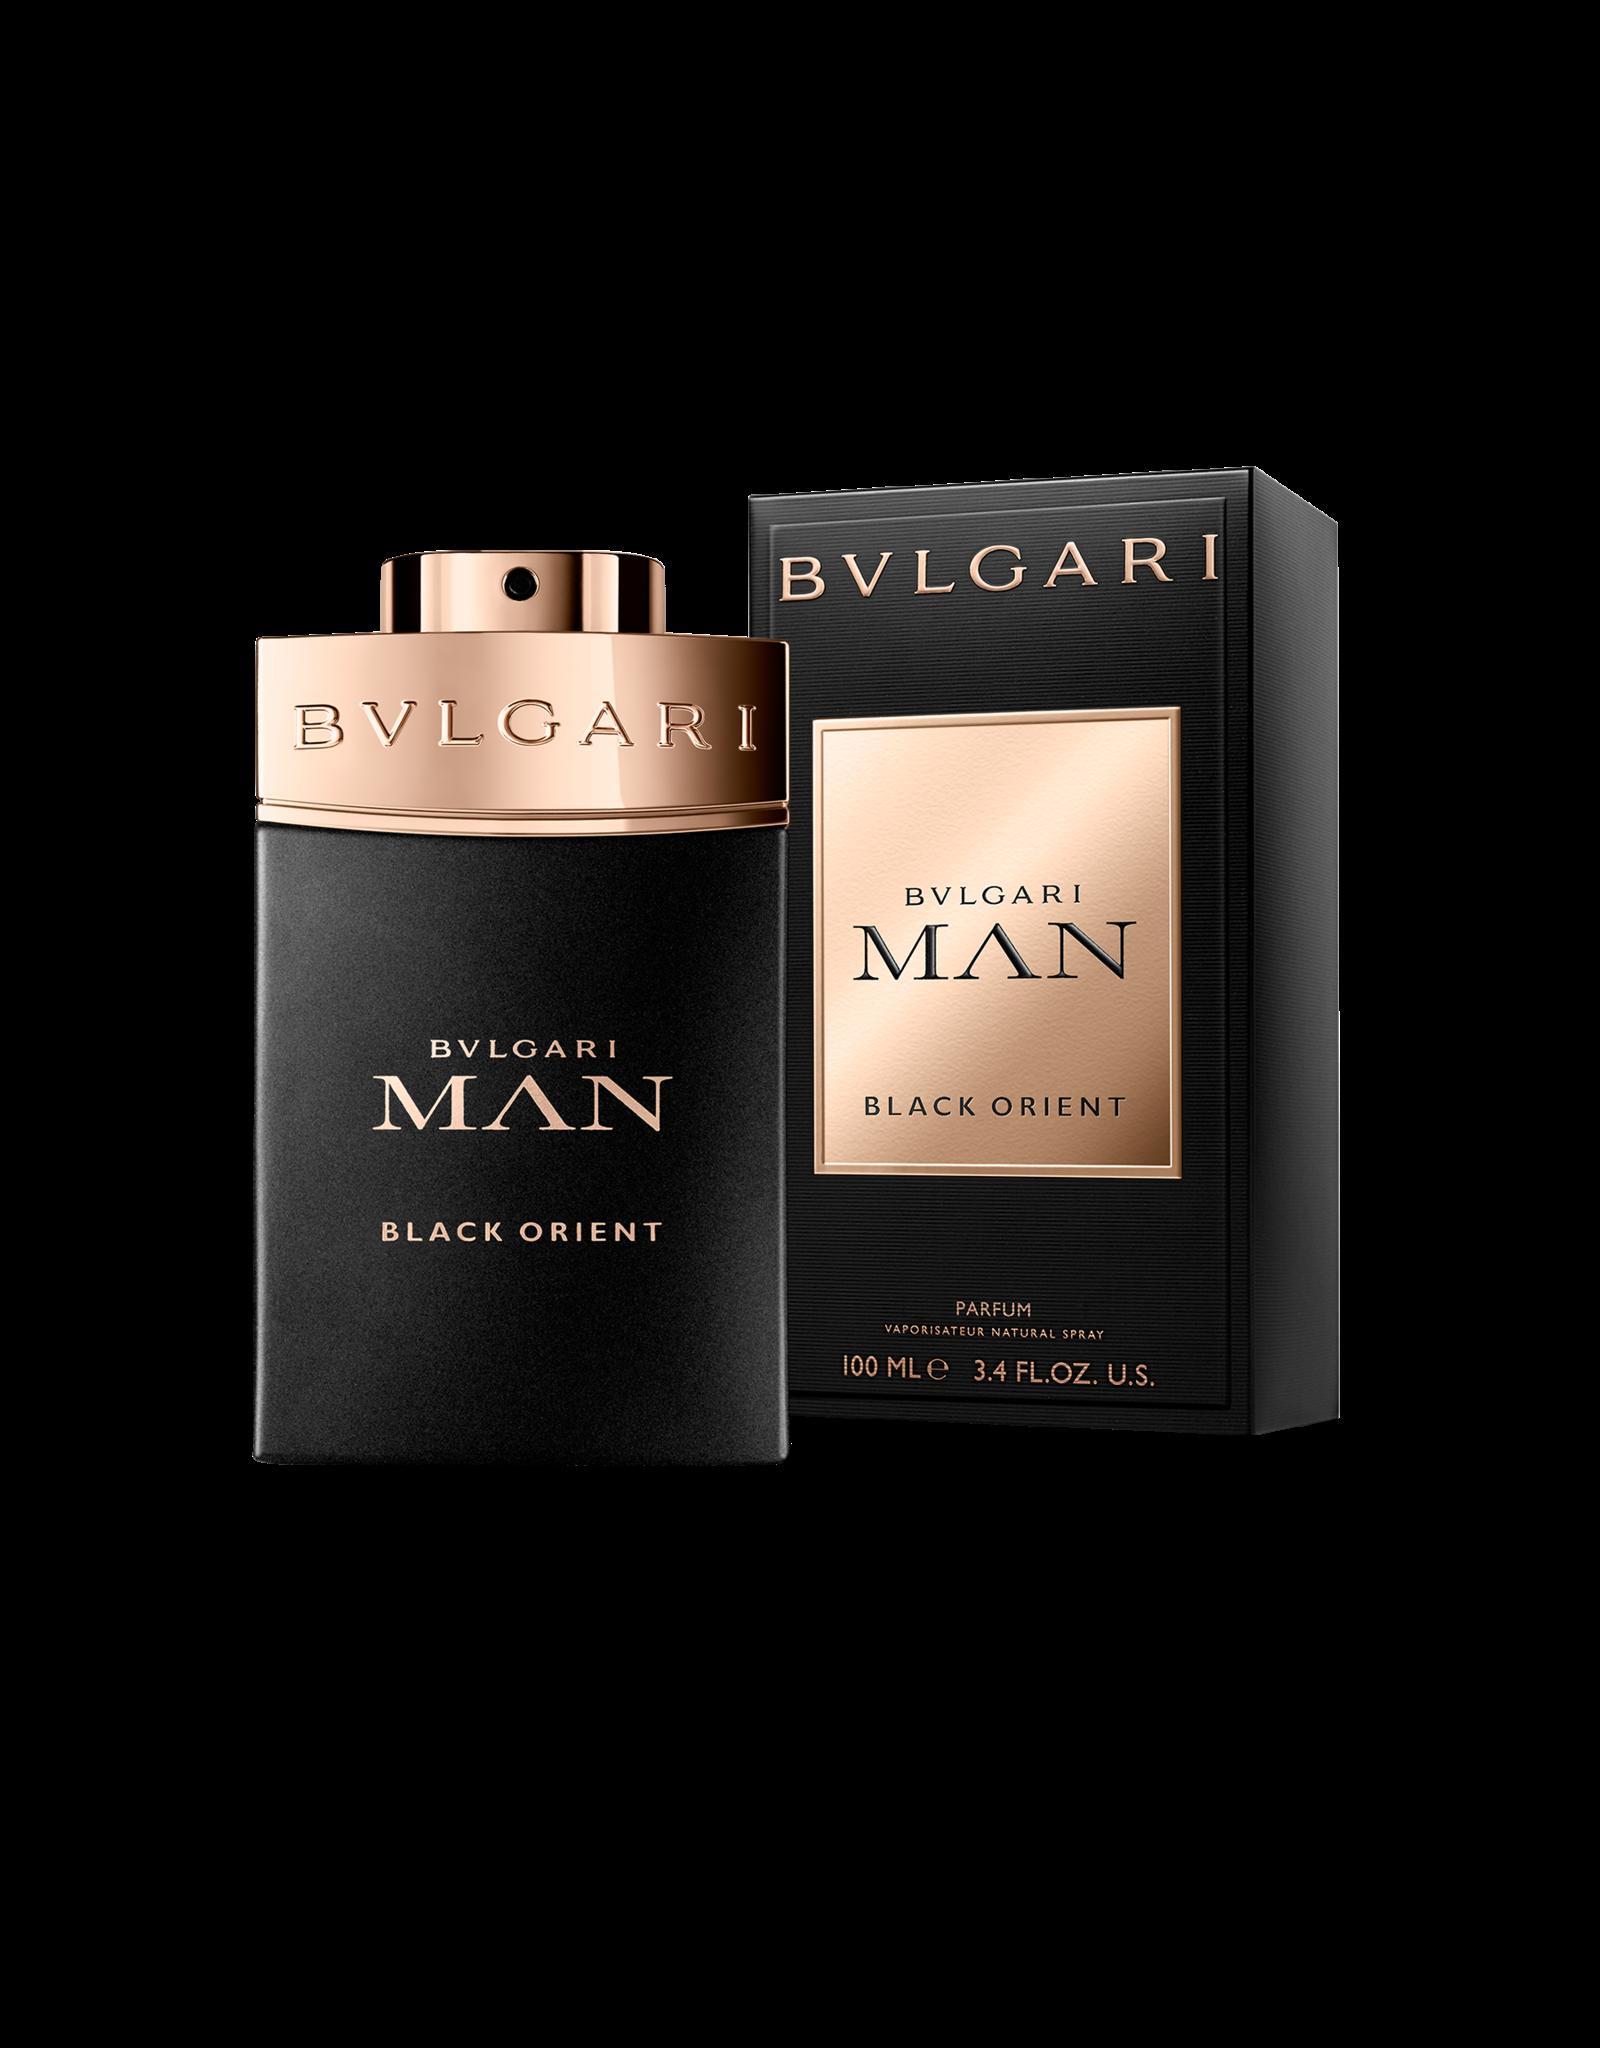 BVLGARI BVLGARI MAN BLACK ORIENT